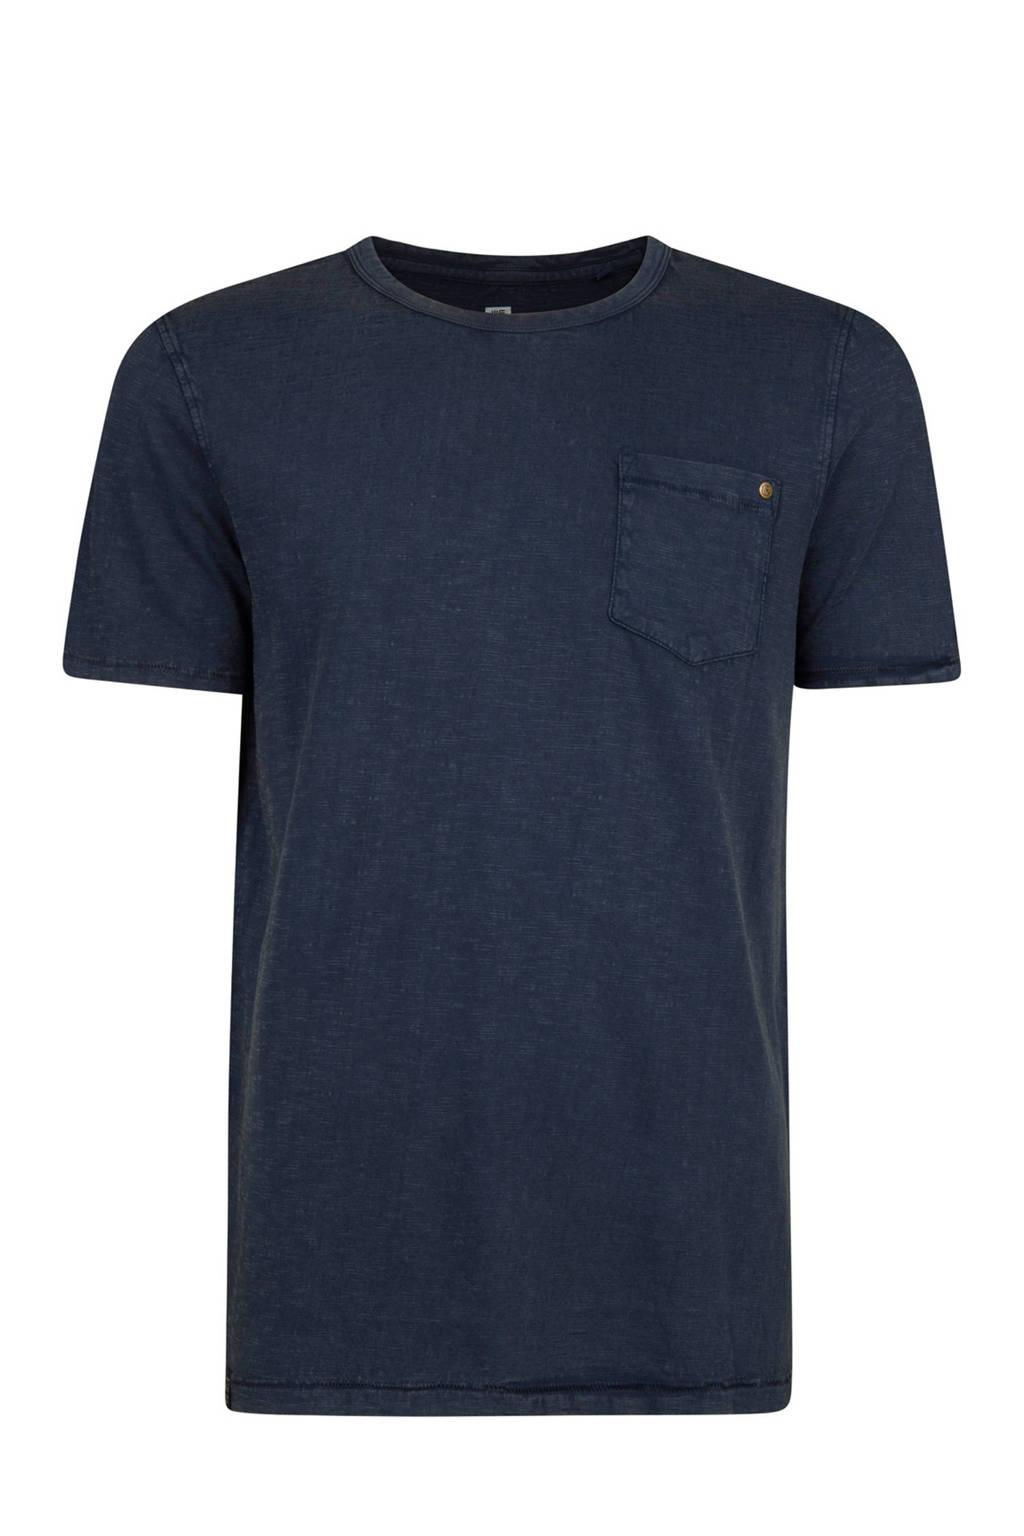 WE Fashion regular fit T-shirt, Blauw